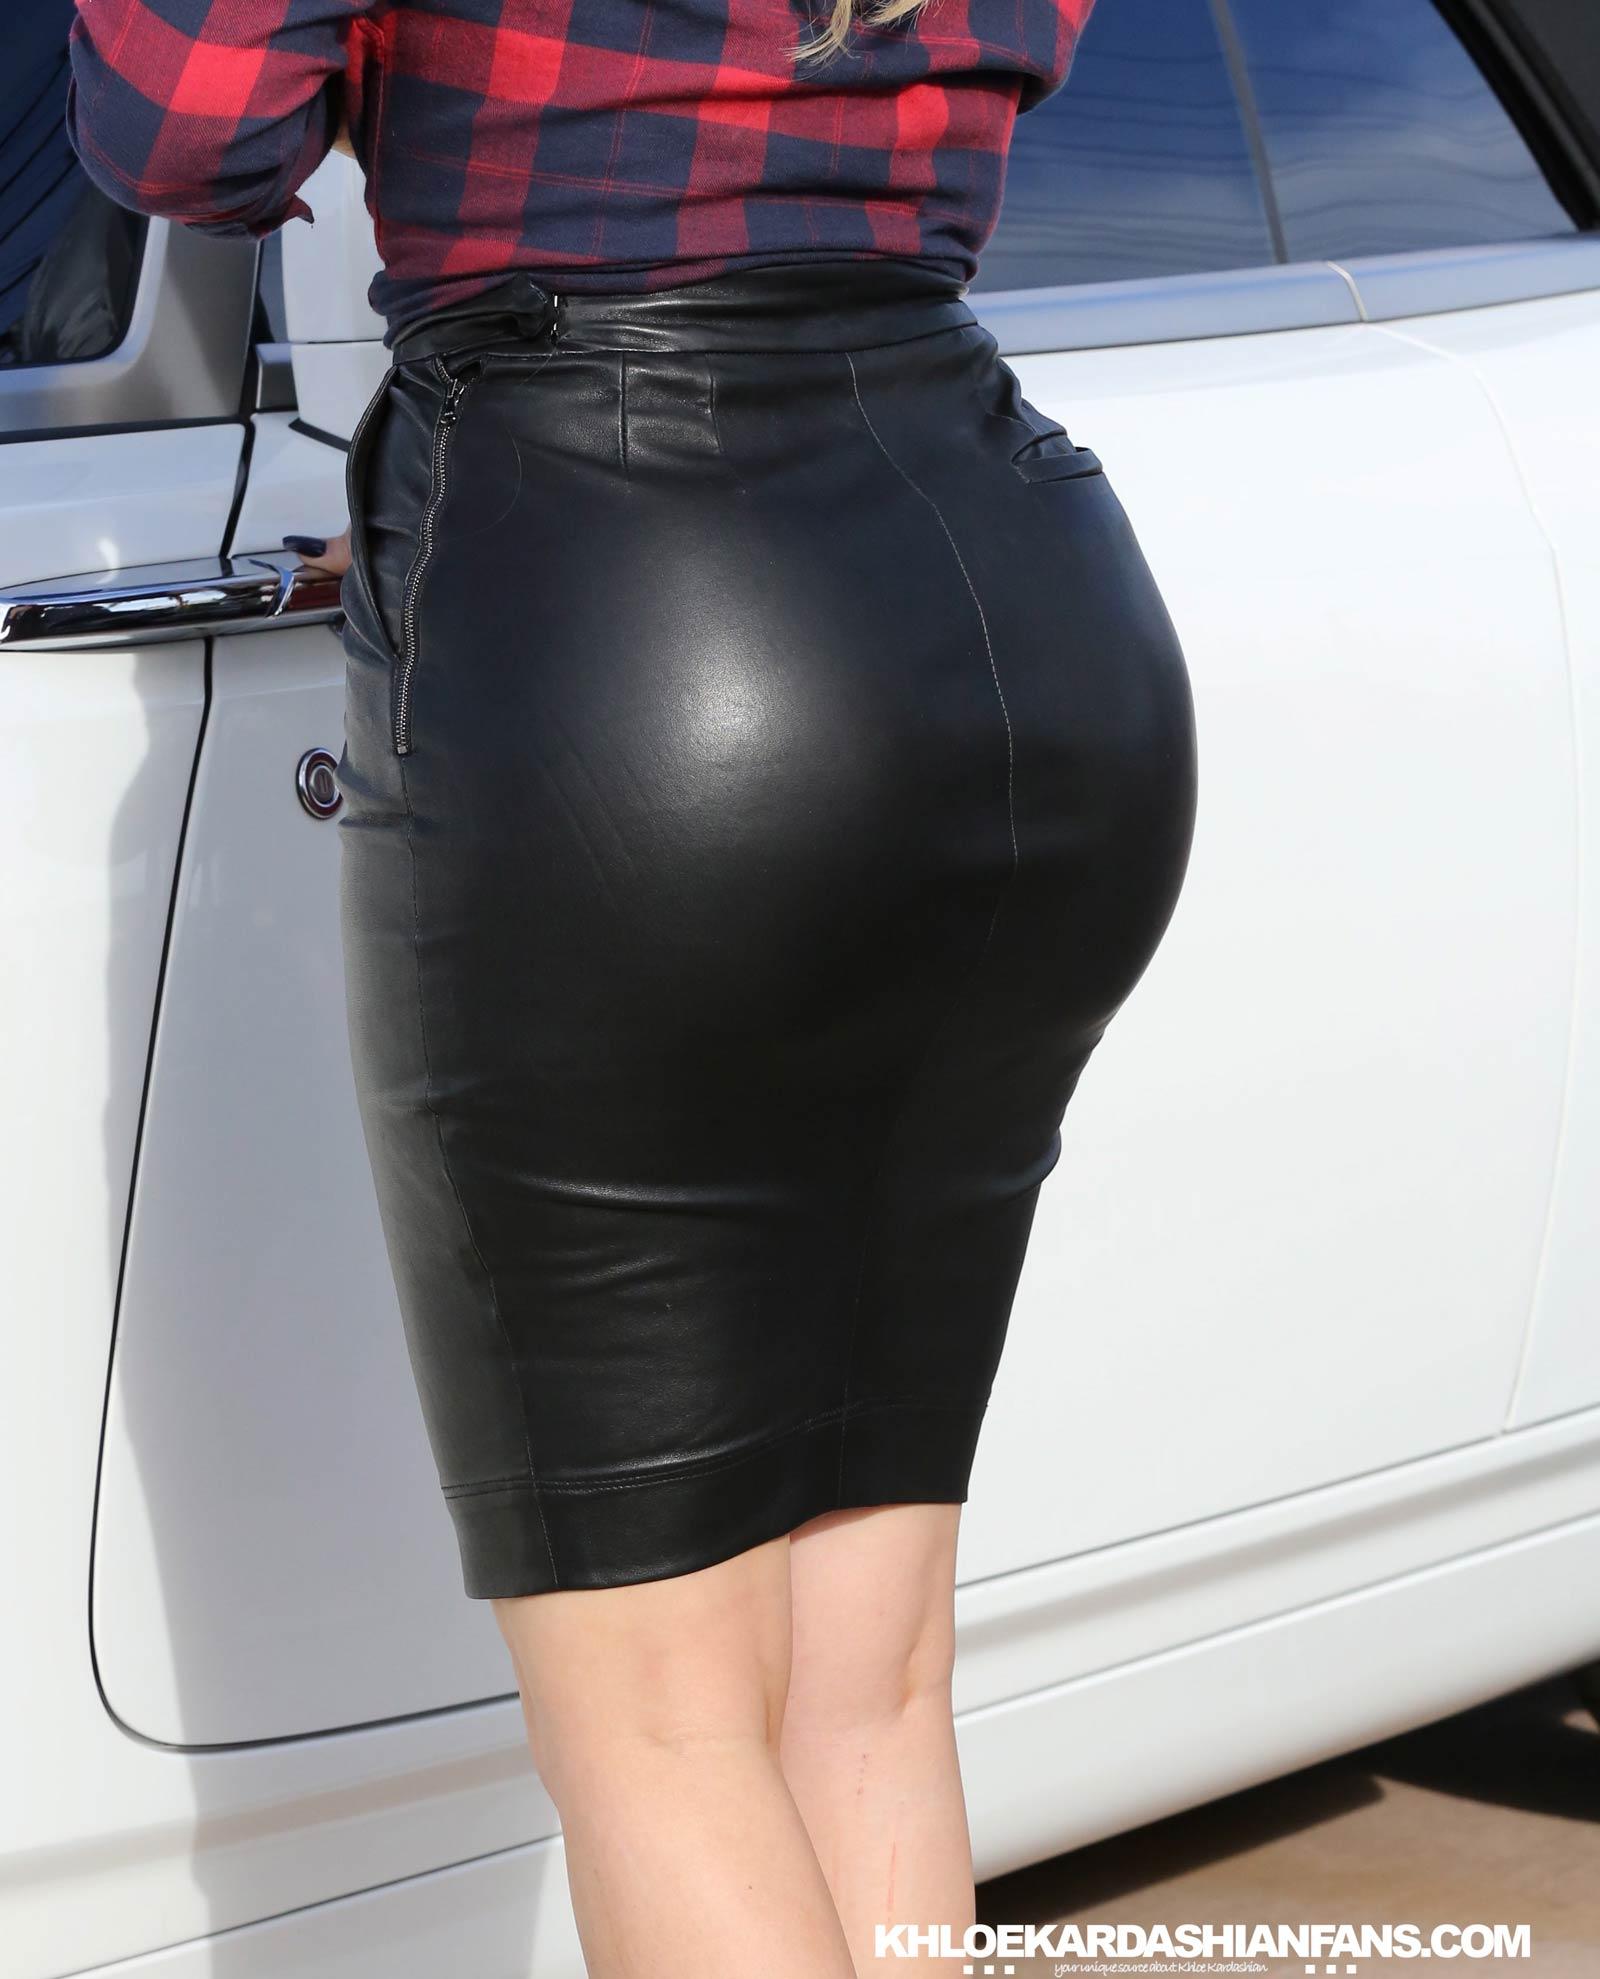 Fat black butt free download hentai galleries